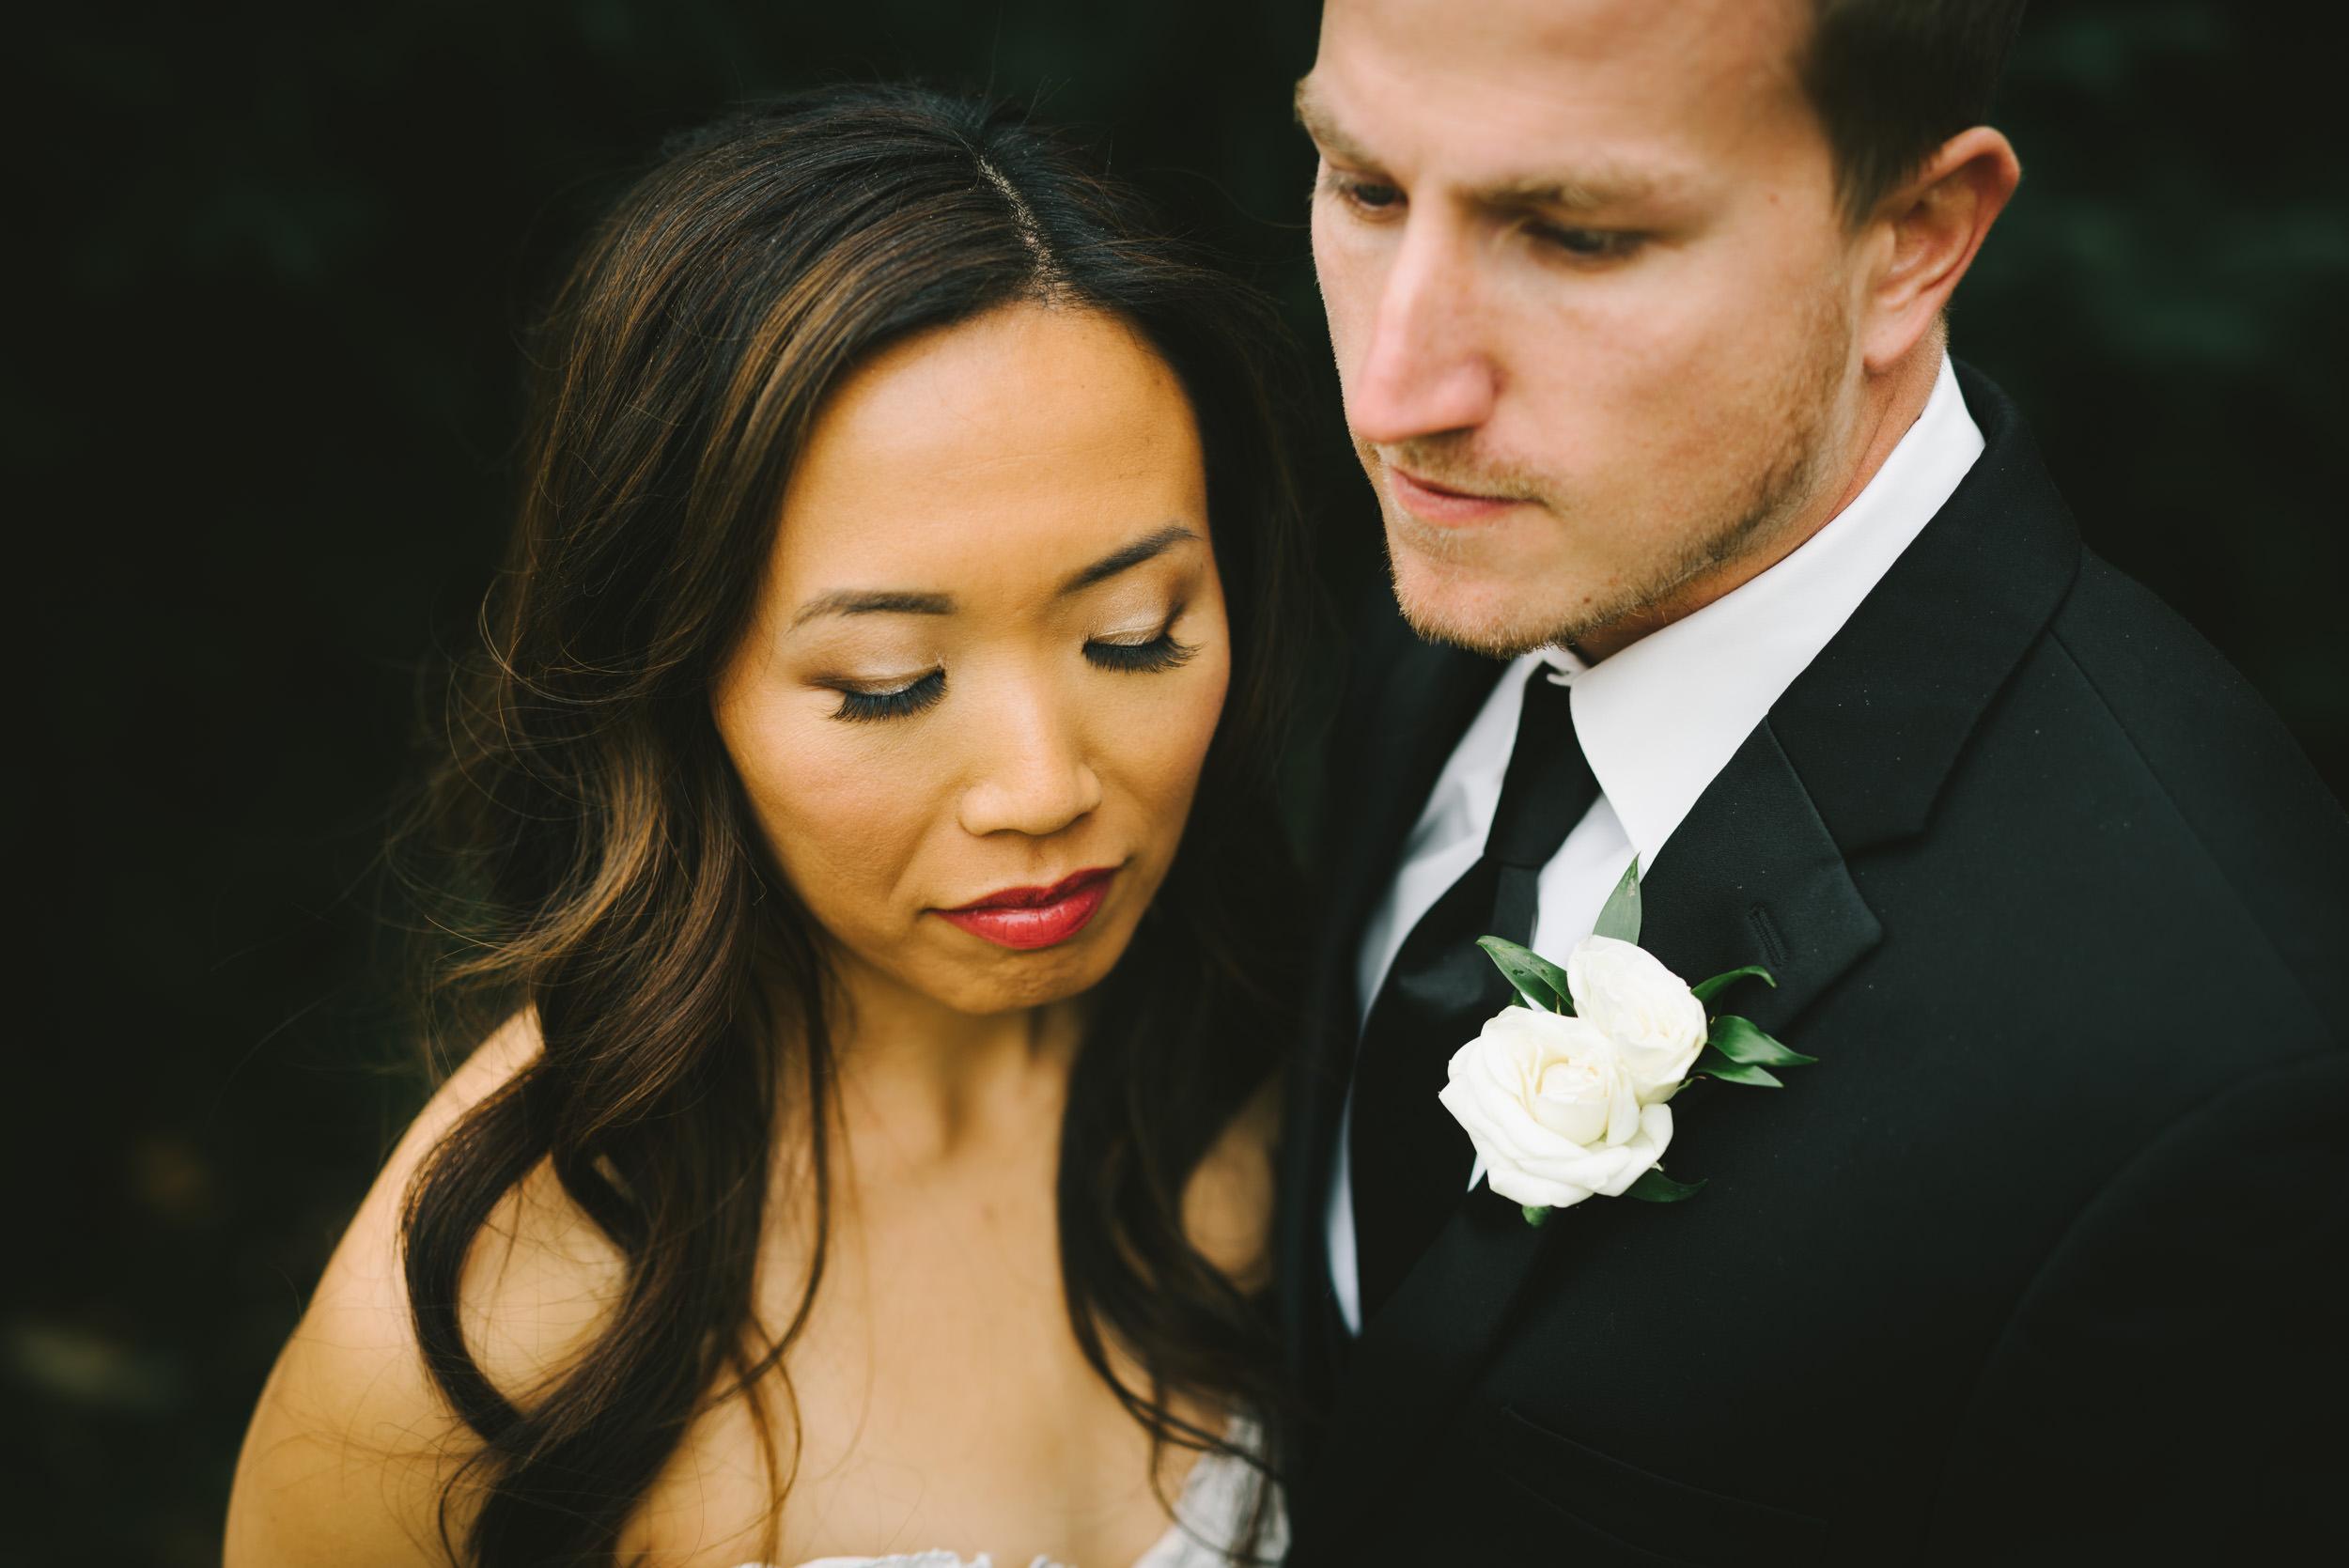 20171029_Wedding-Kristin-Garrett-363.jpg